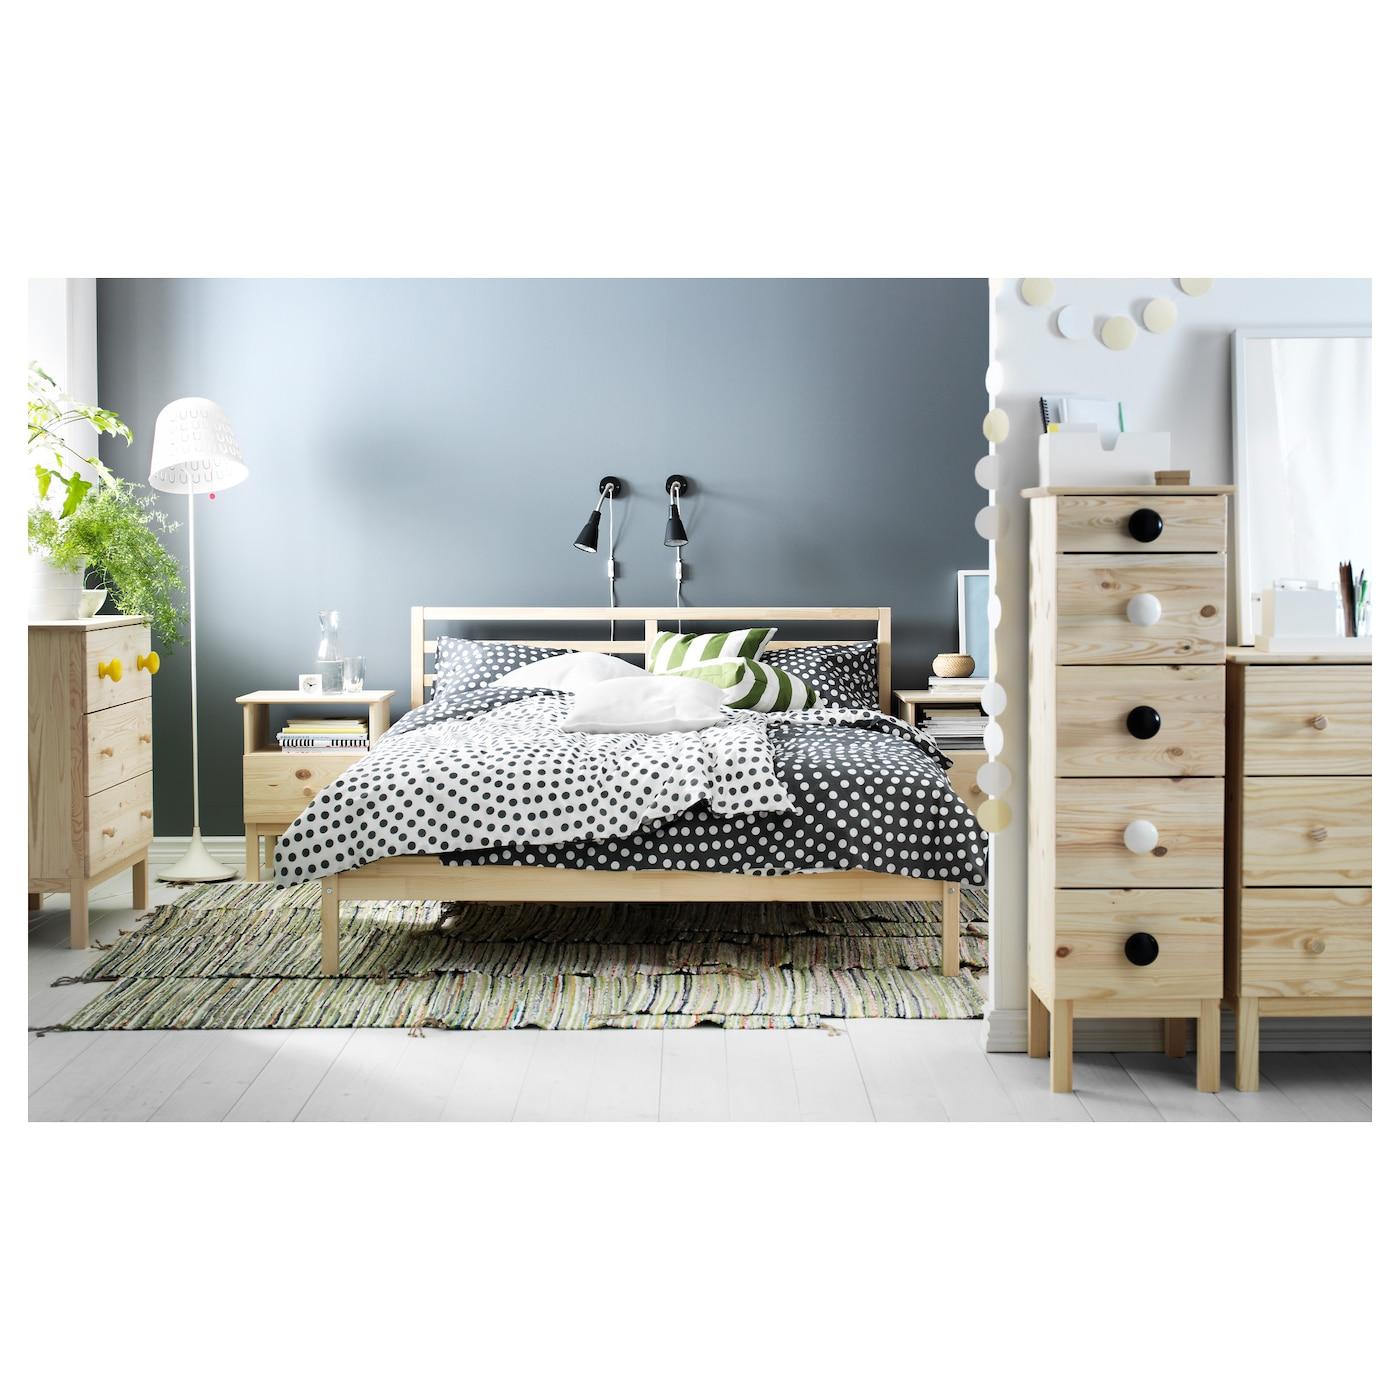 TARVA Bed frame Pine luröy Standard Double IKEA